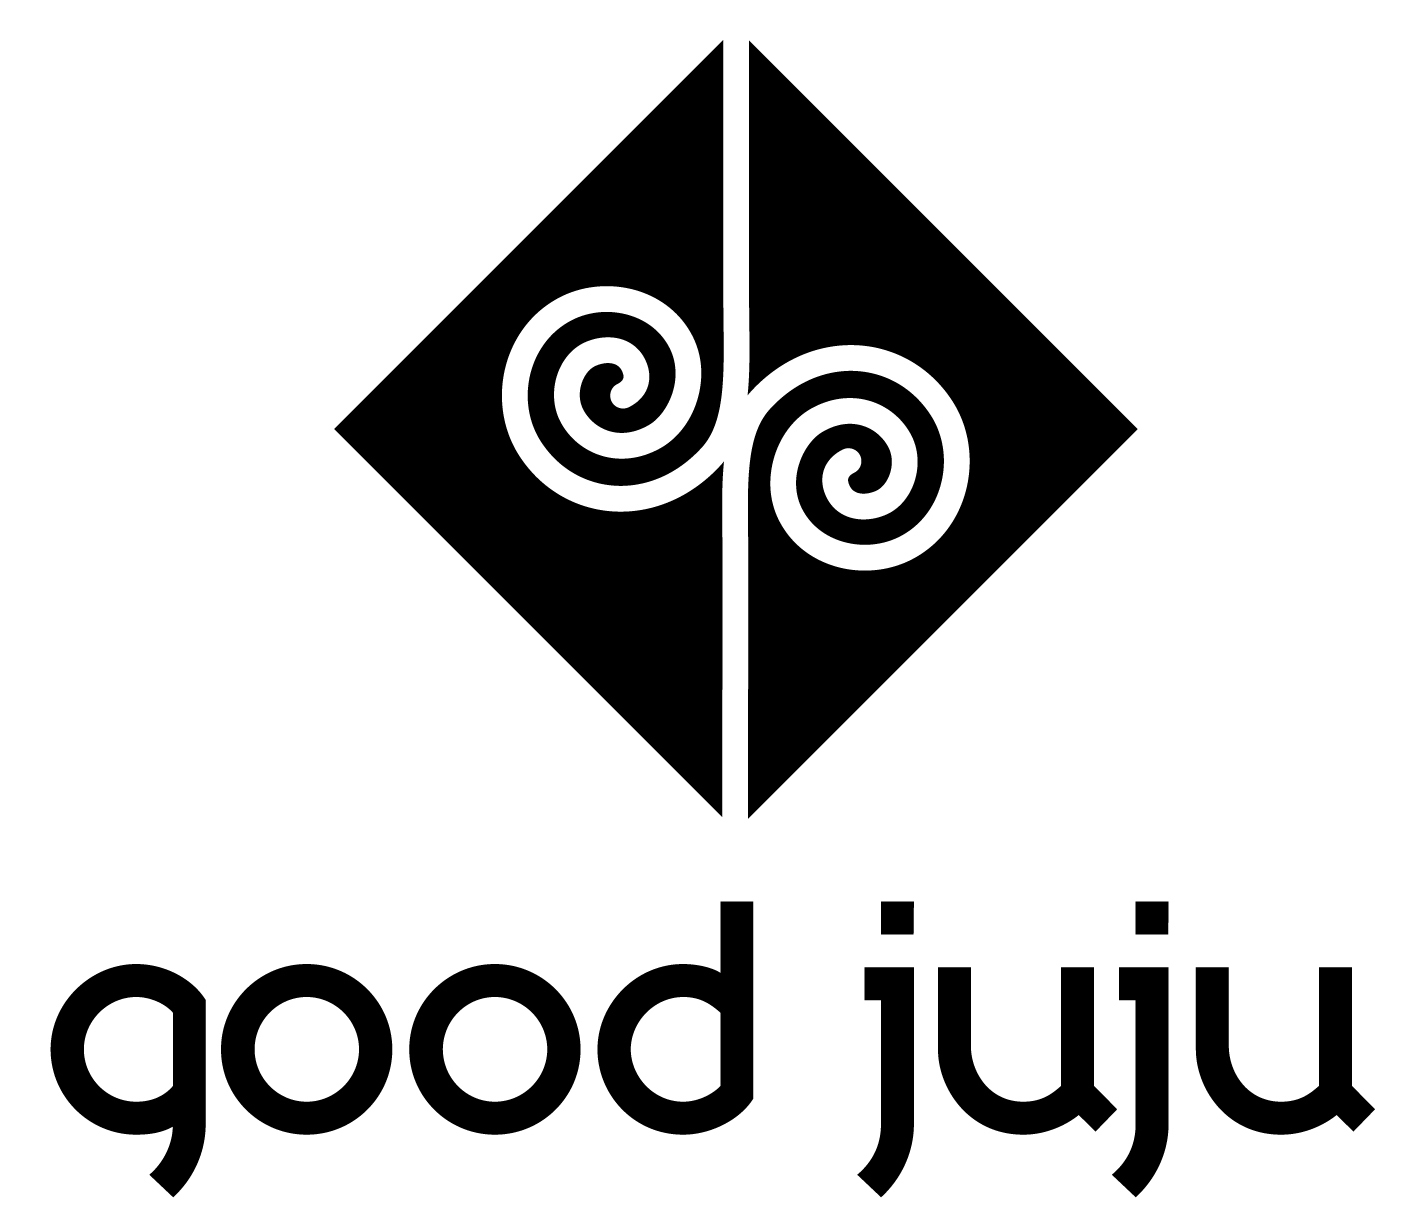 Good juju